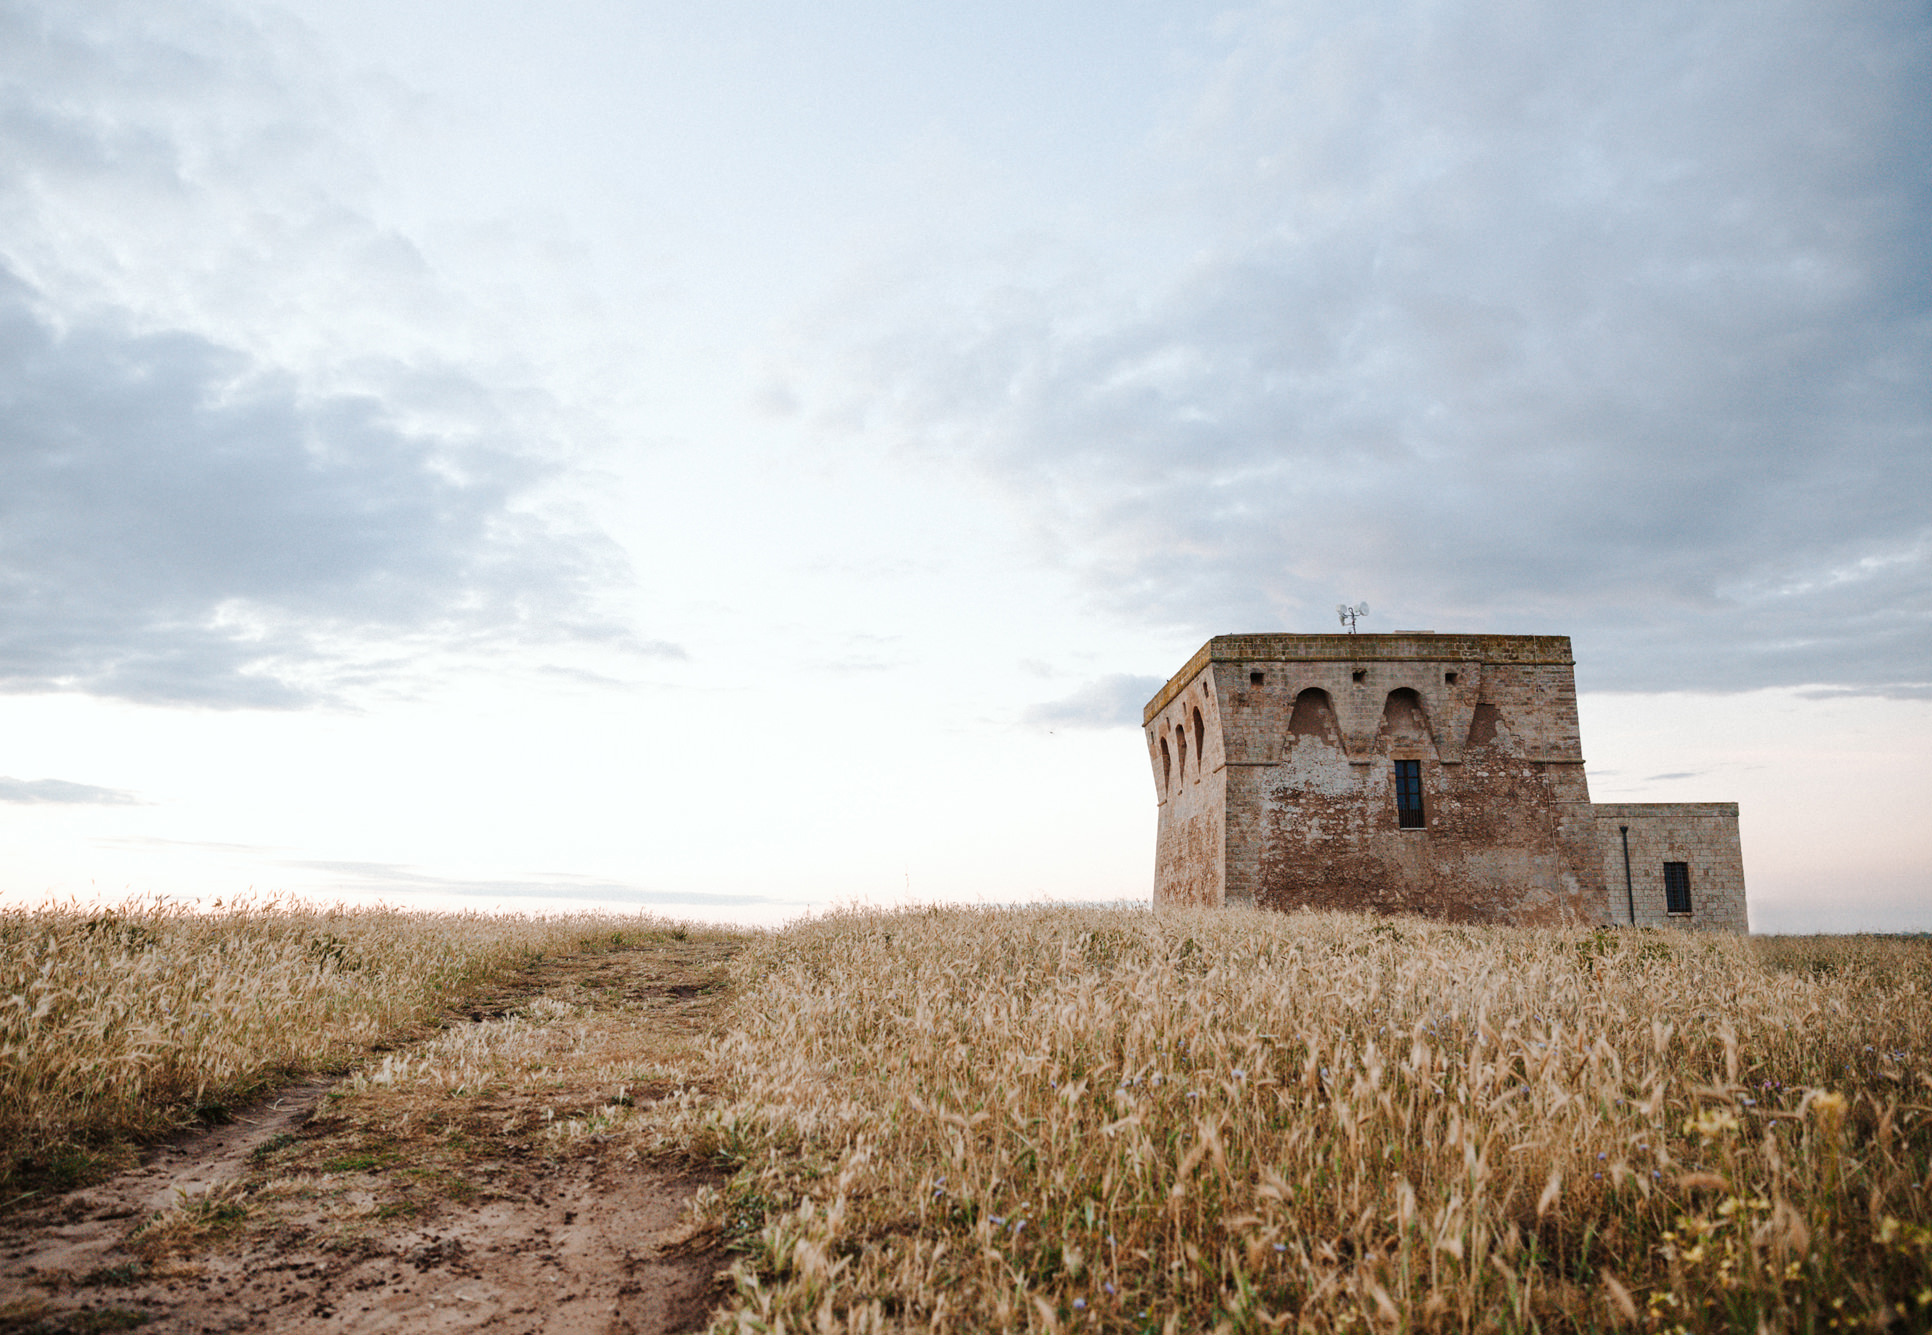 Romantic elopement in Apulia | Apulia elopement | Apulia wedding Camilla Anchisi Photography